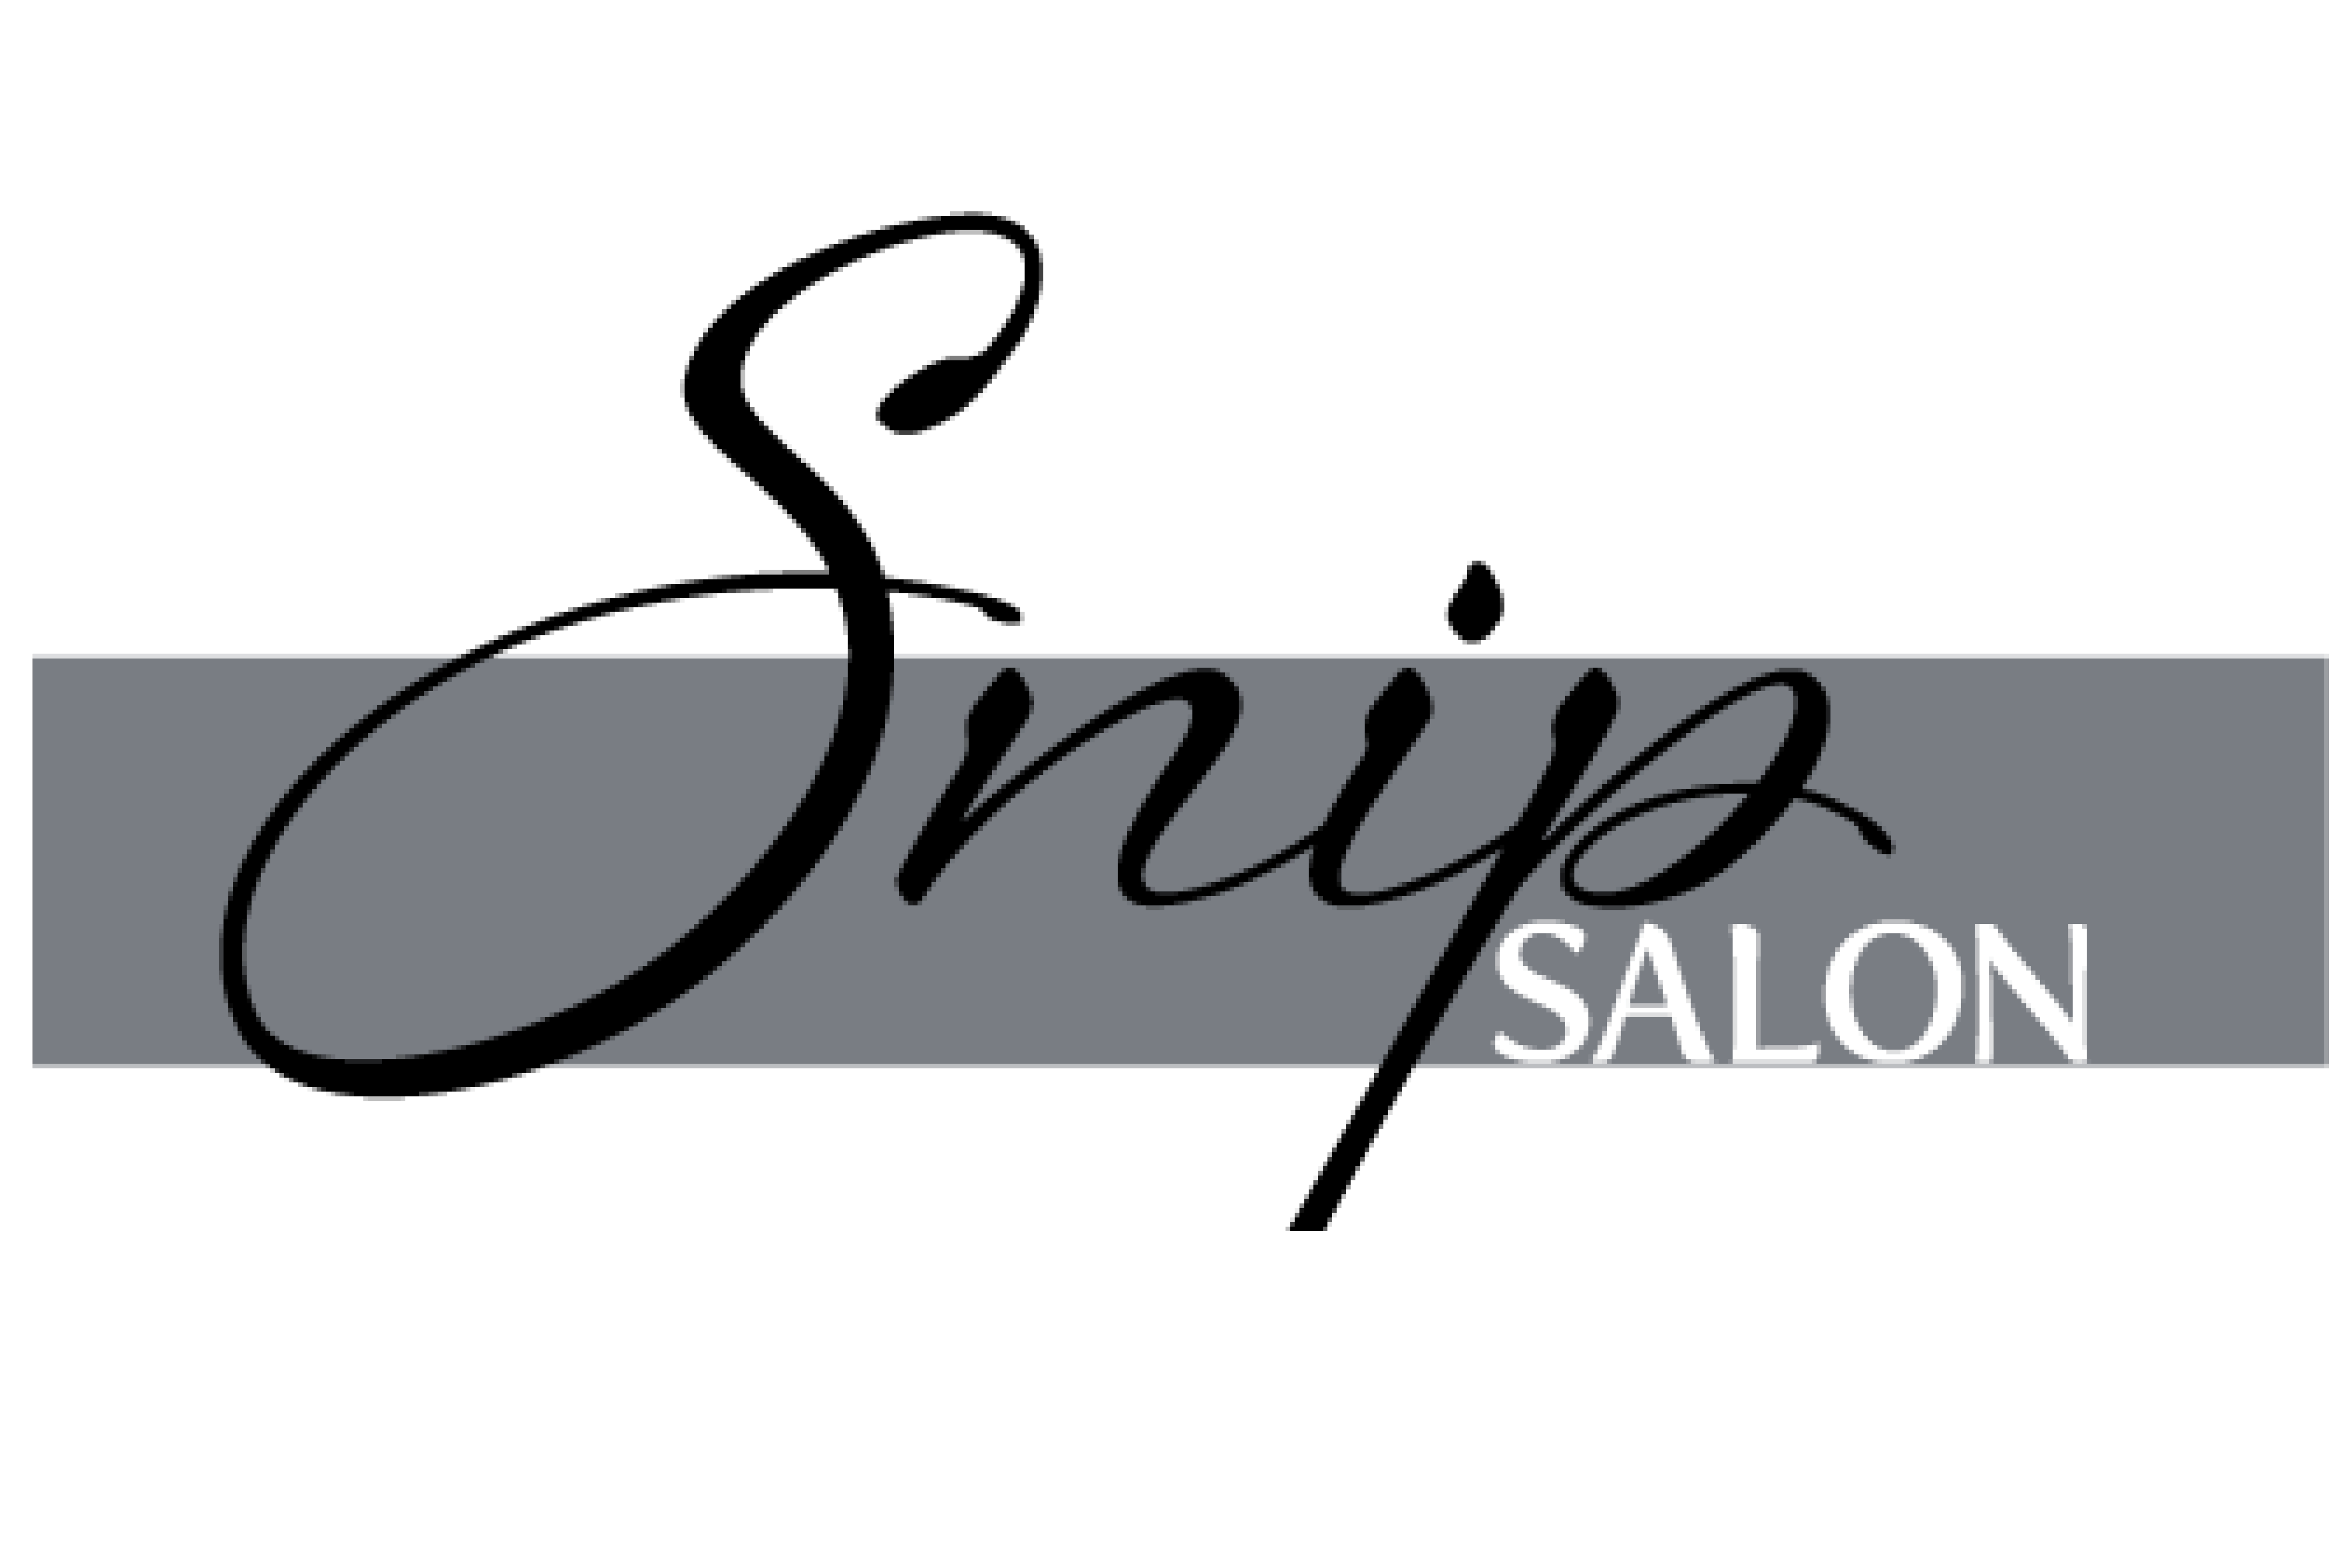 Snip_400x600